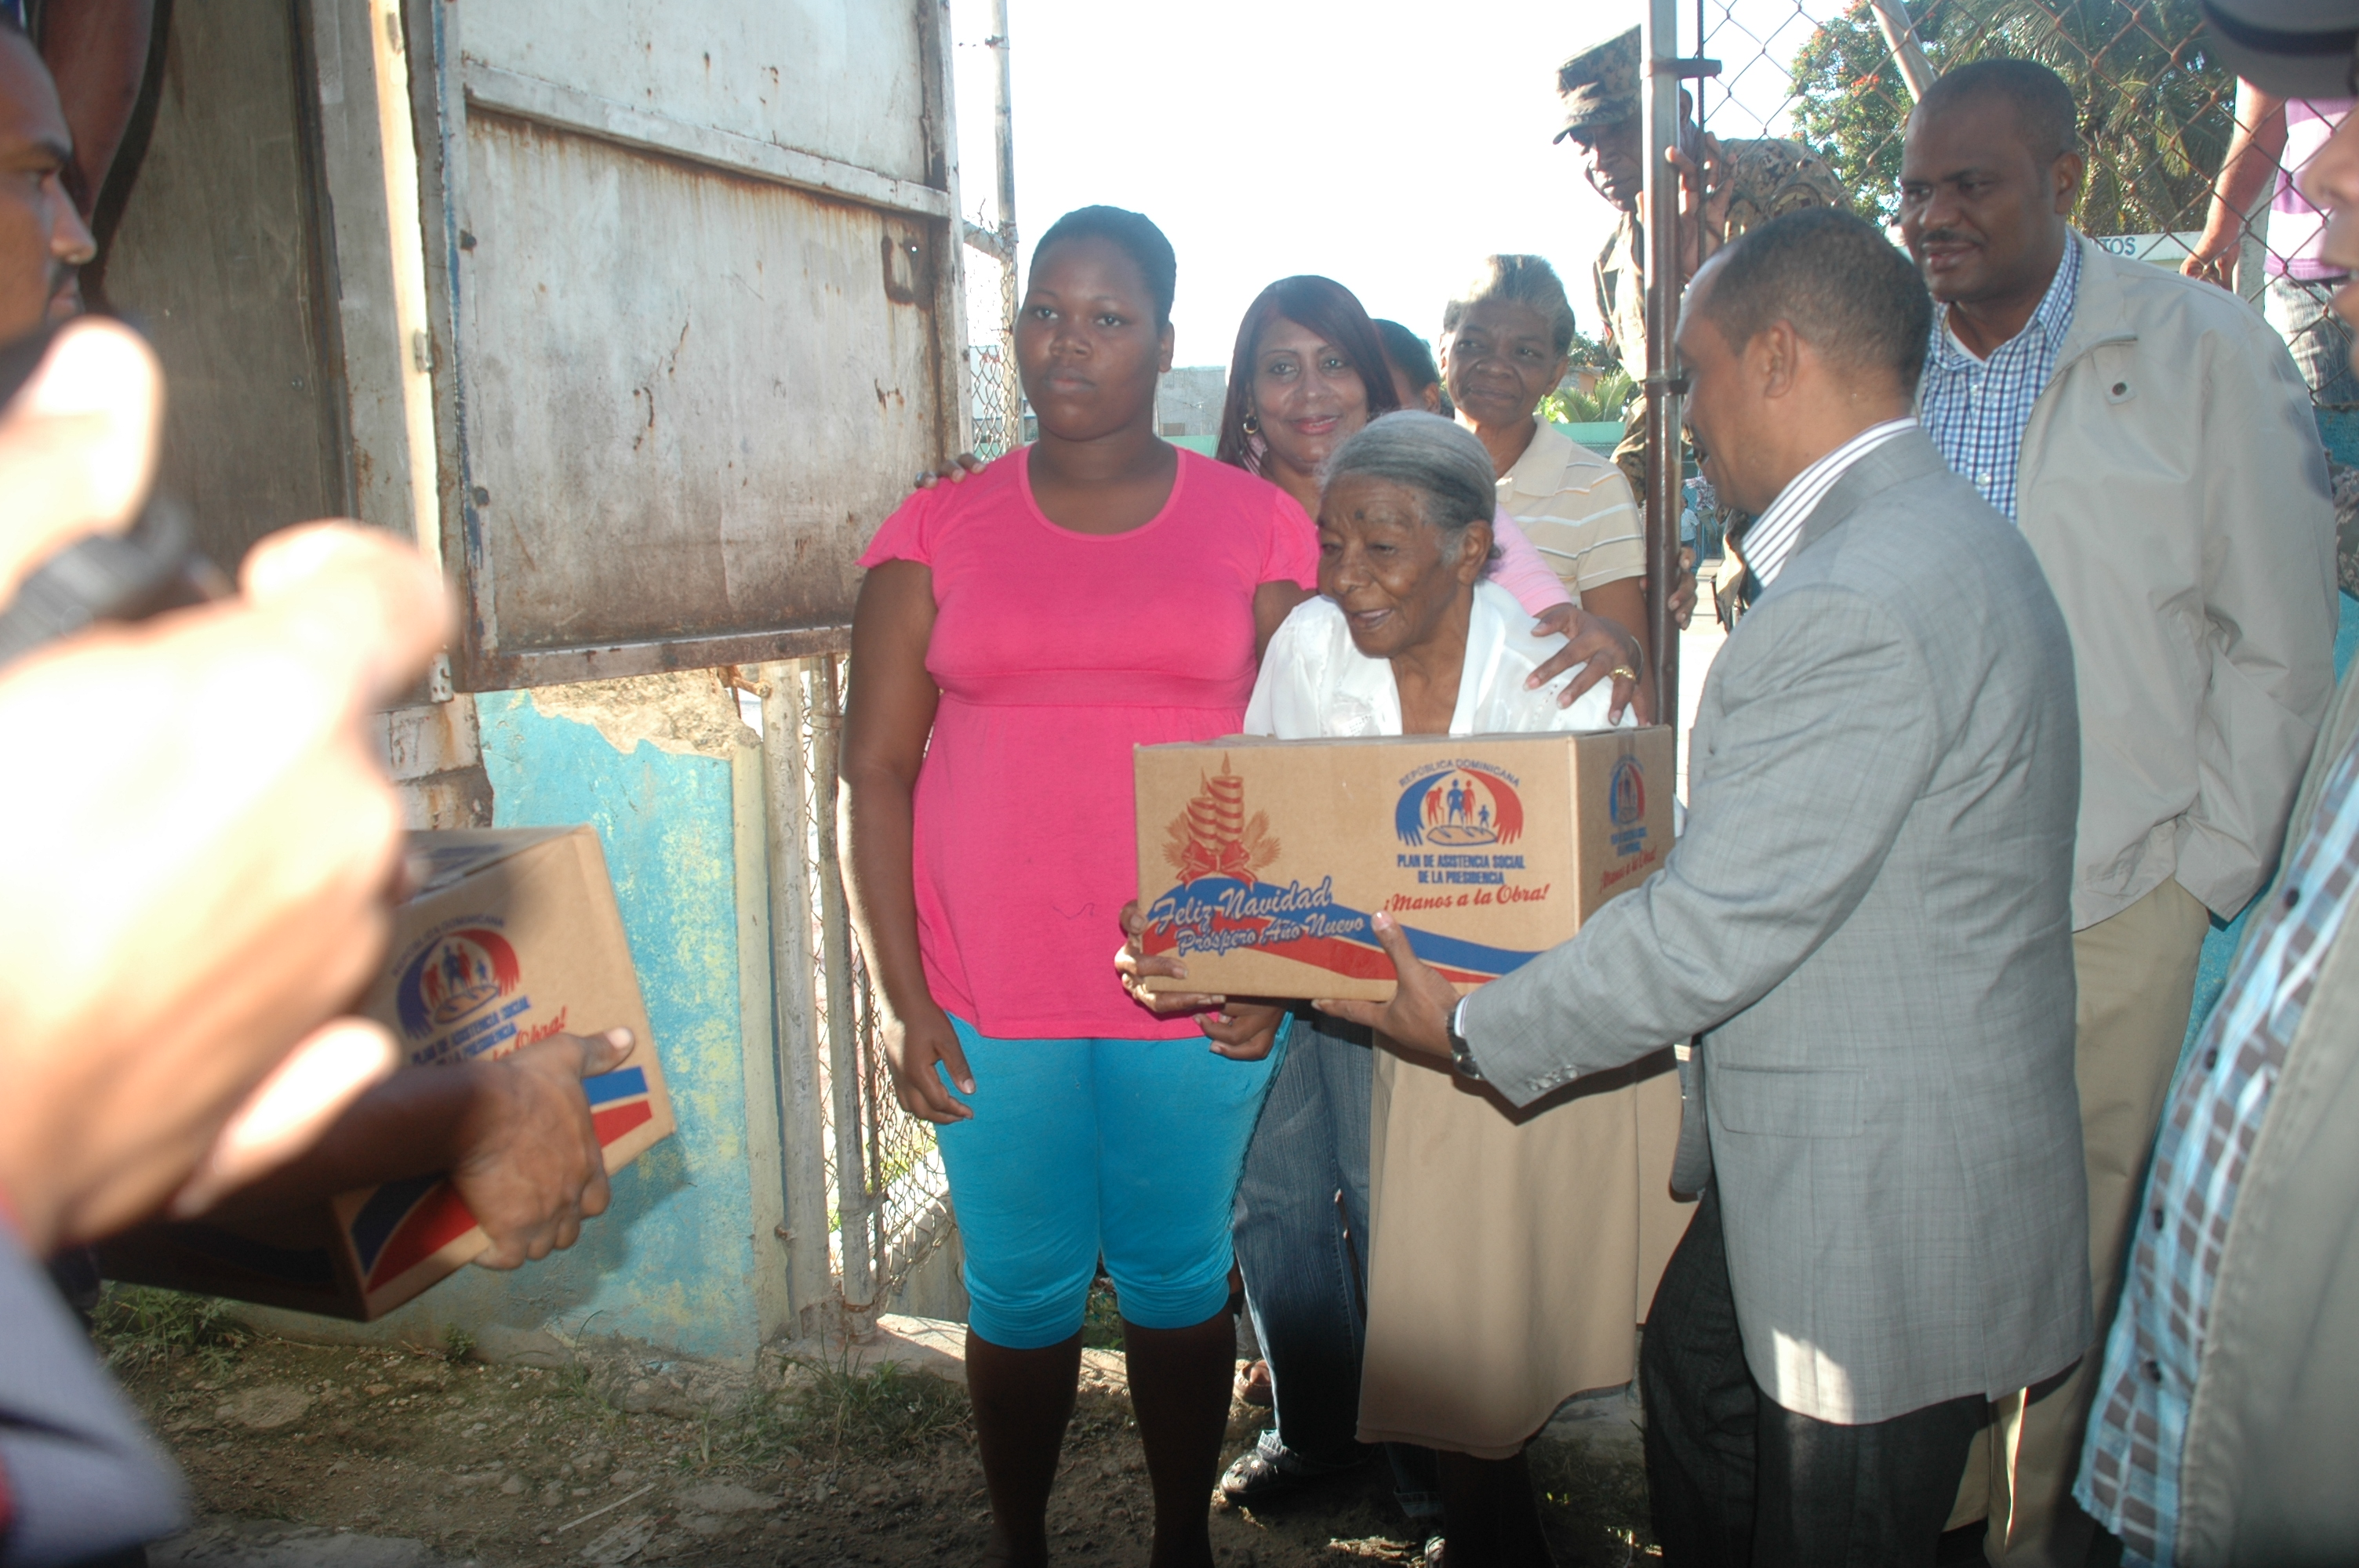 Inician entrega de 15 mil cajas navideñas en San Cristóbal